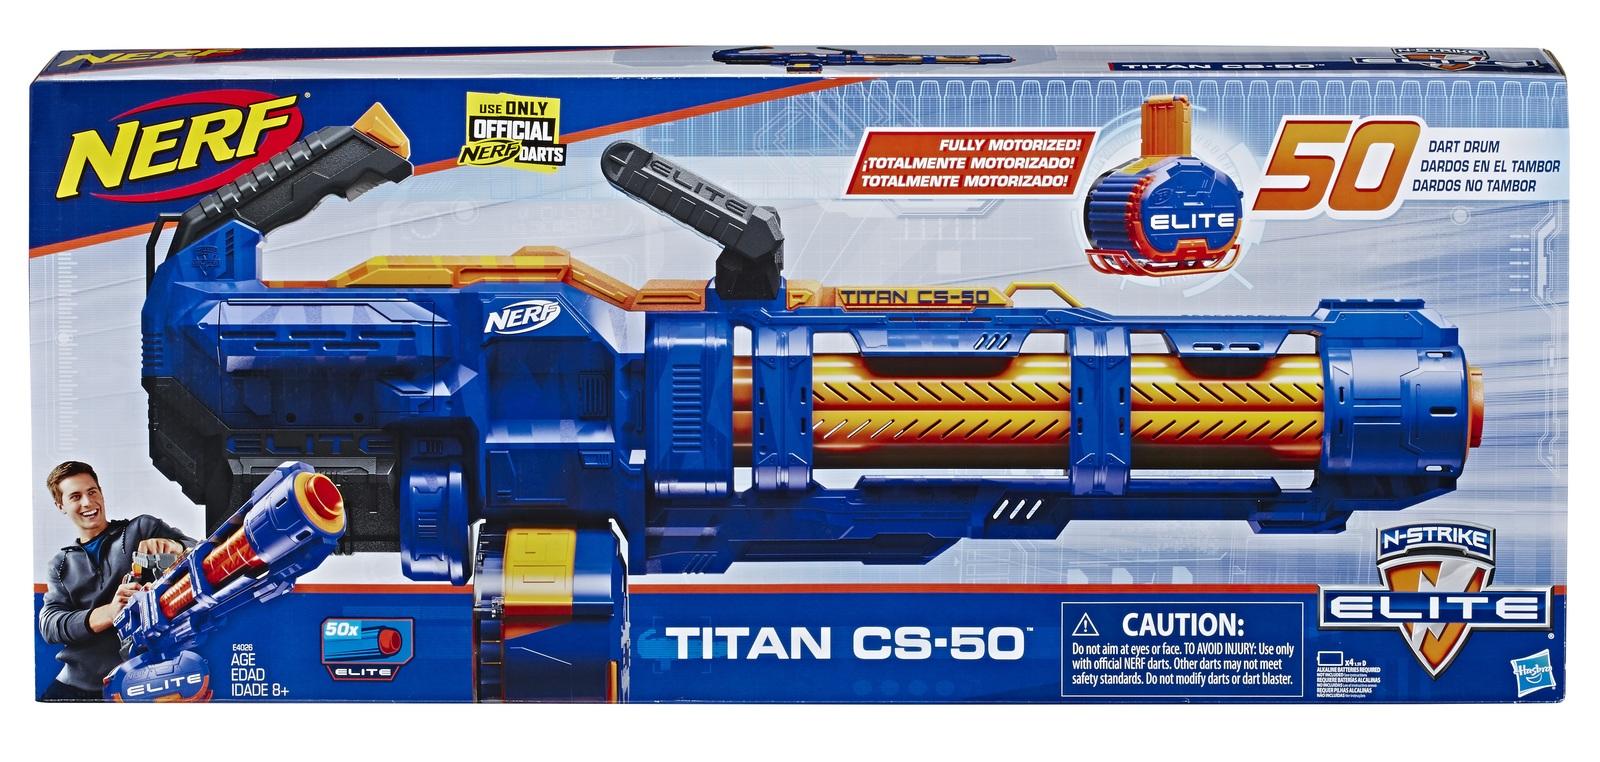 Nerf - Titan CS-50 Blaster image